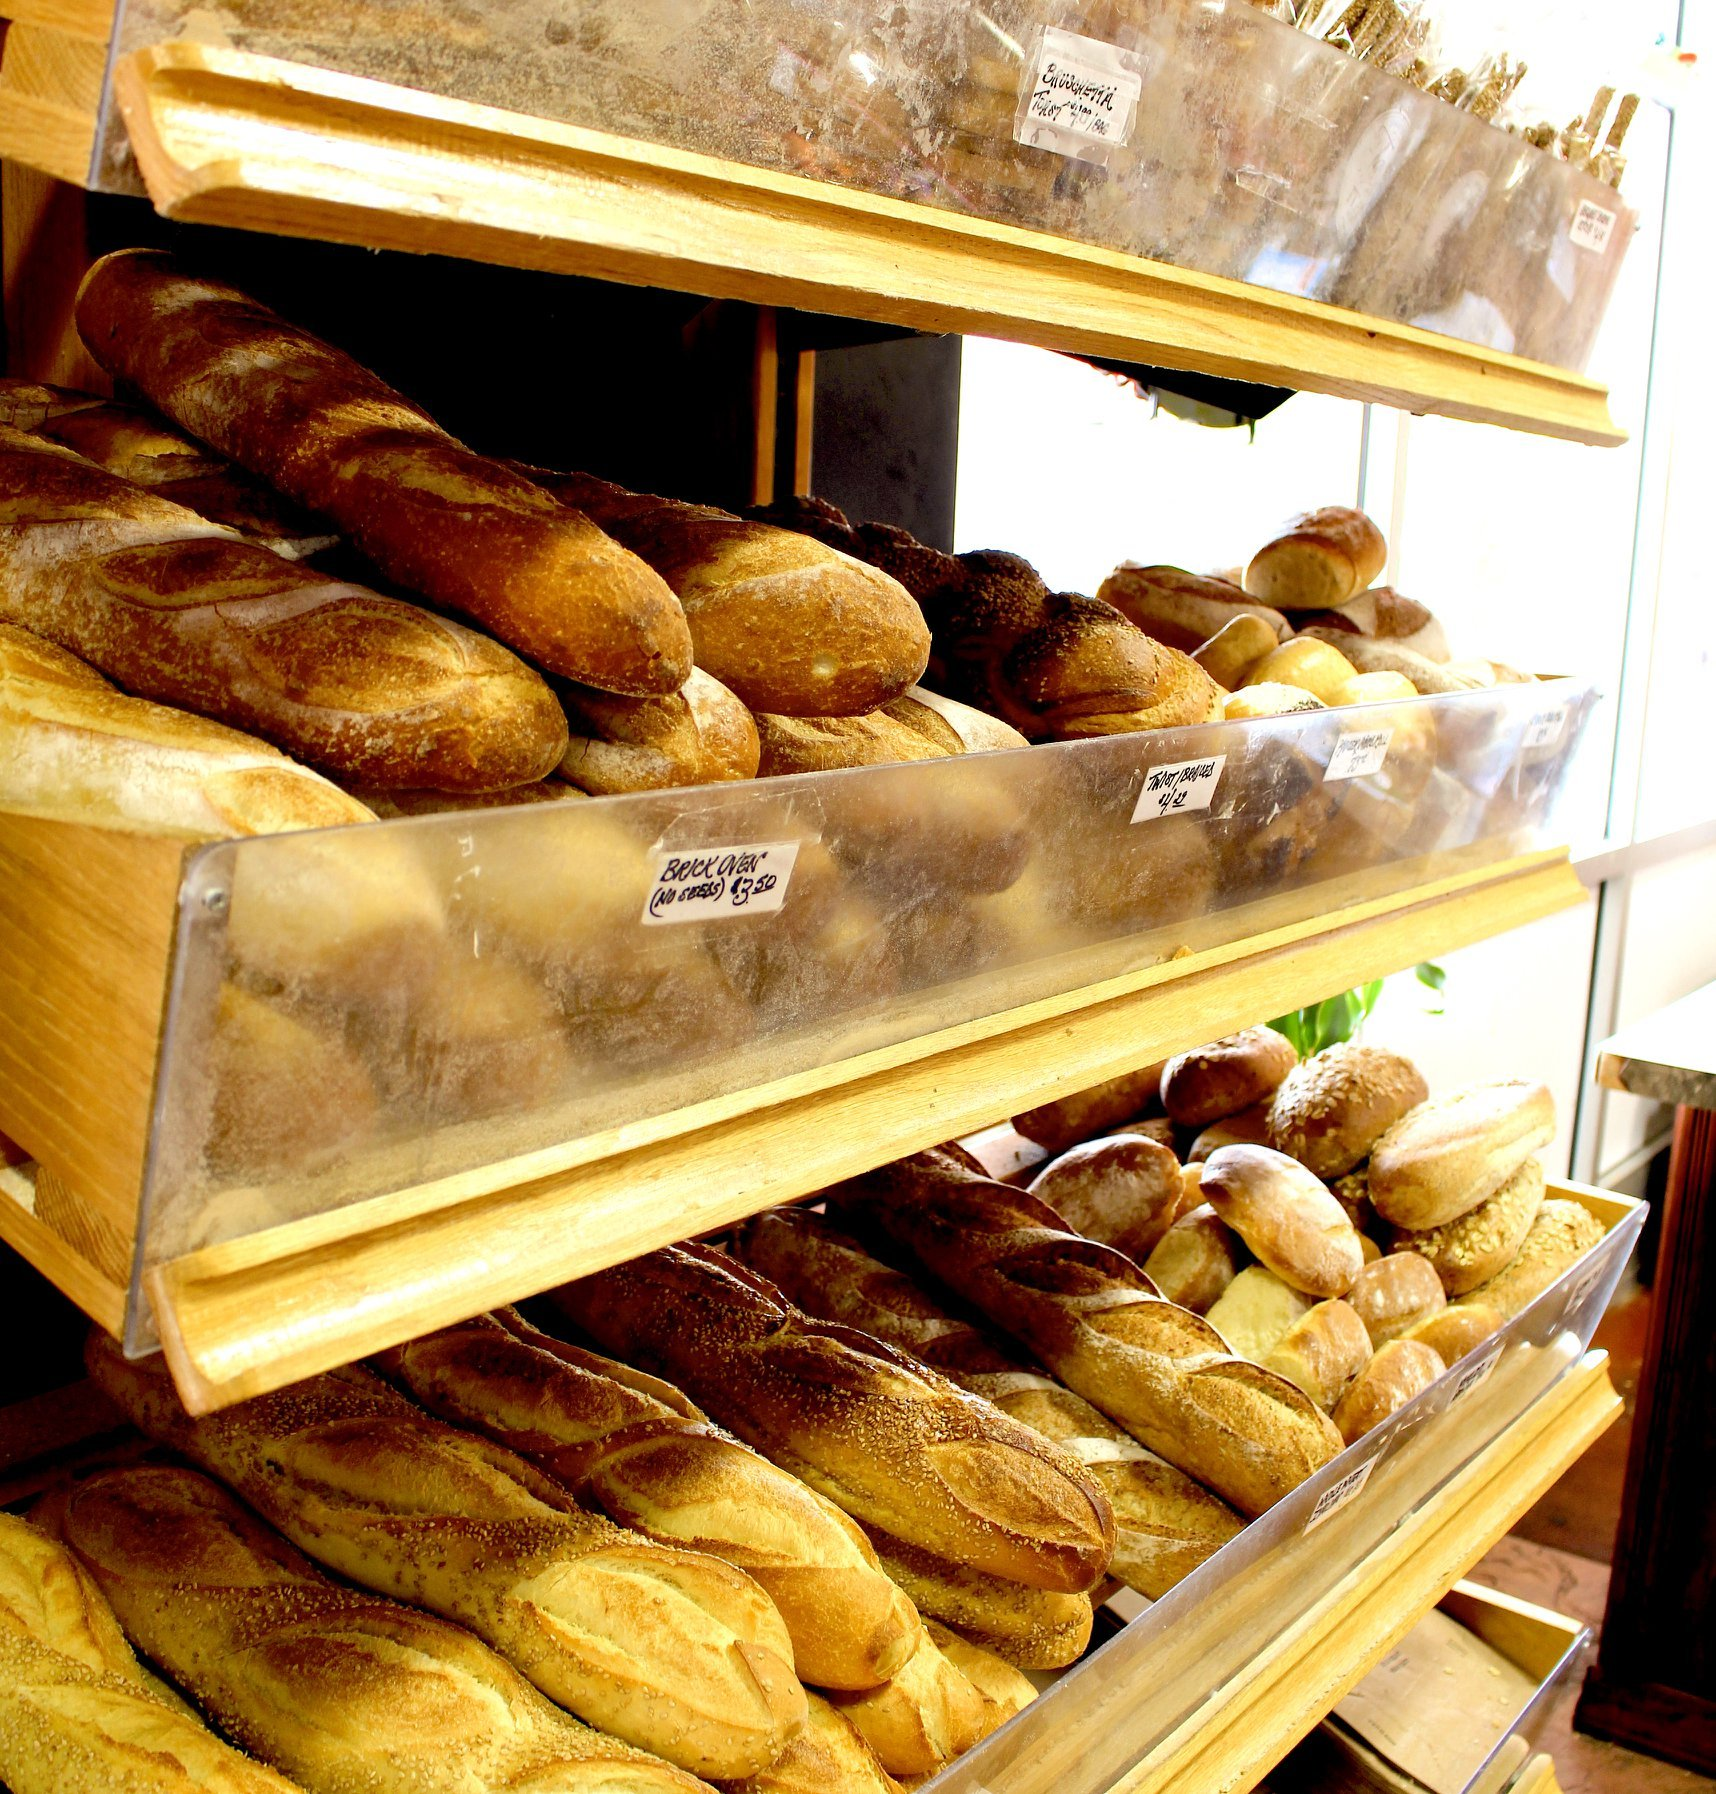 Italian Foods Near Me: Tinton Falls, New Jersey